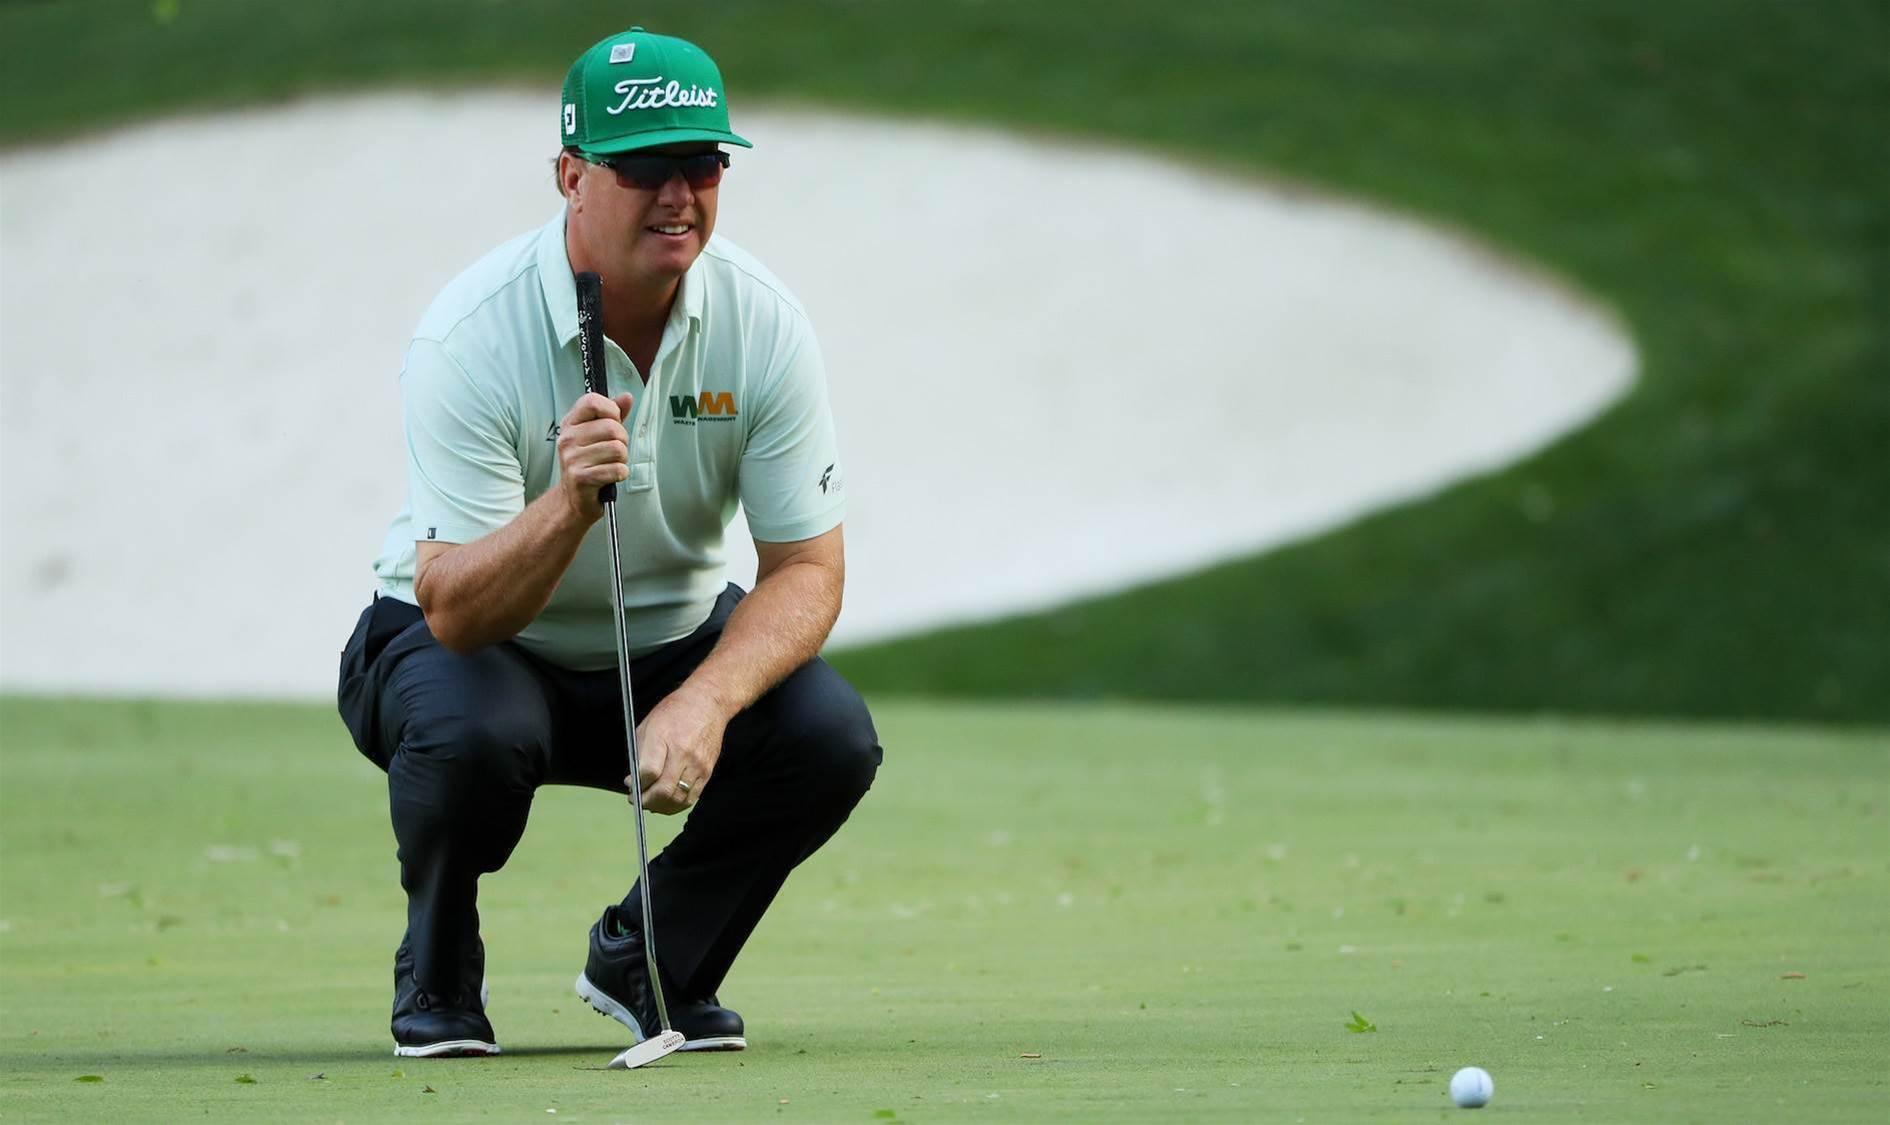 MASTERS: Hoffman makes 65 look like a breeze